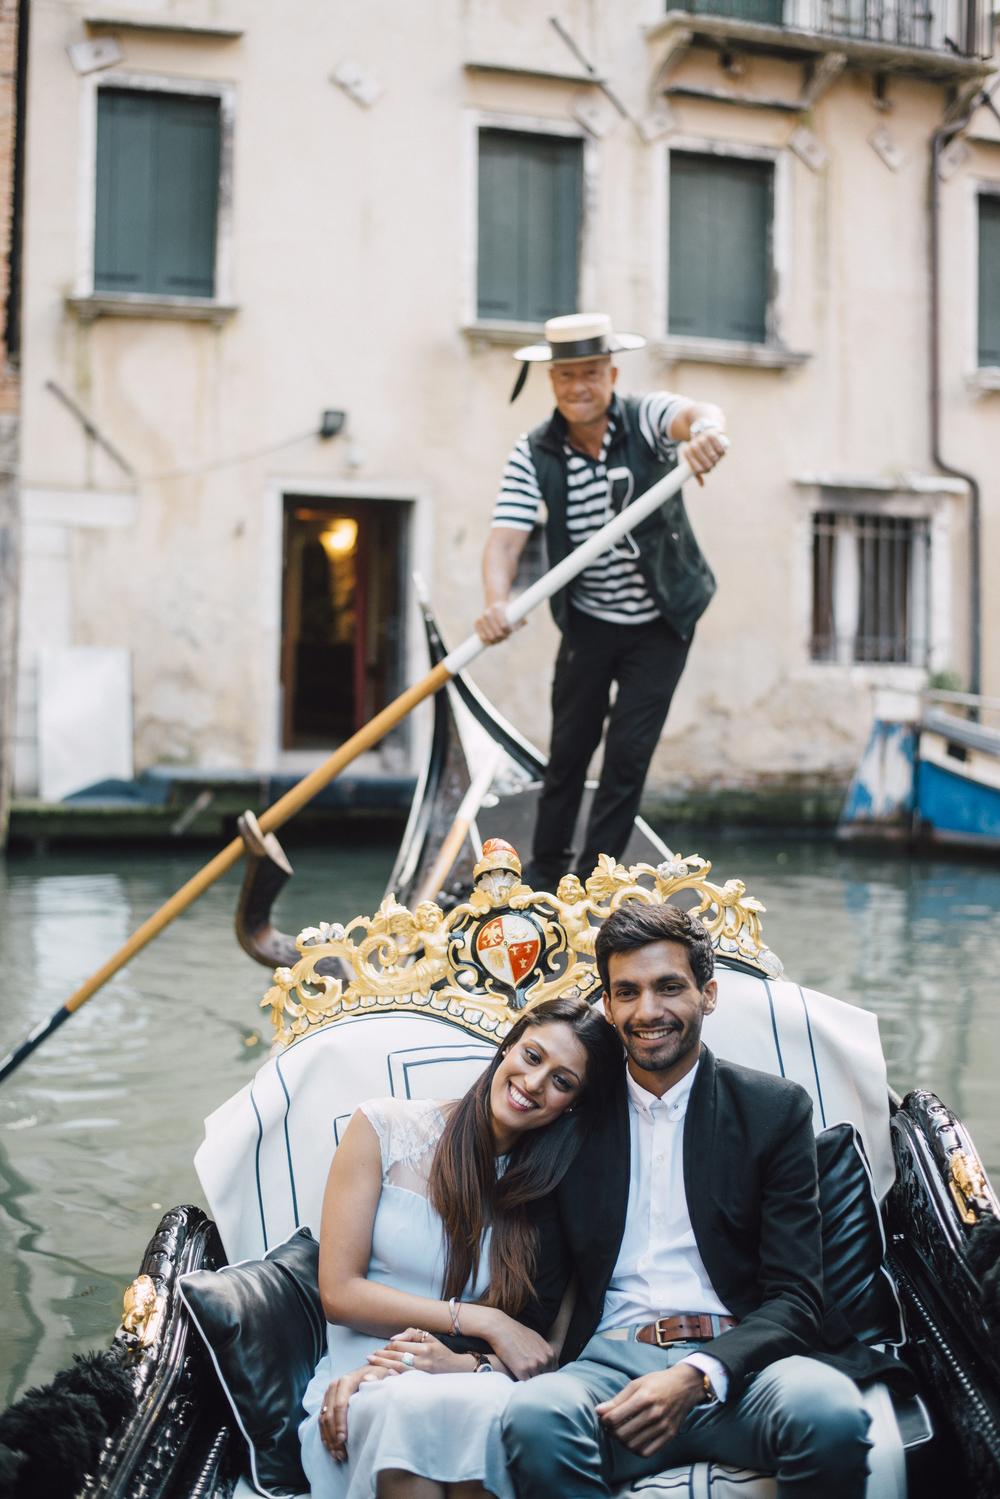 Romantic gondola ride down the canals of Venice